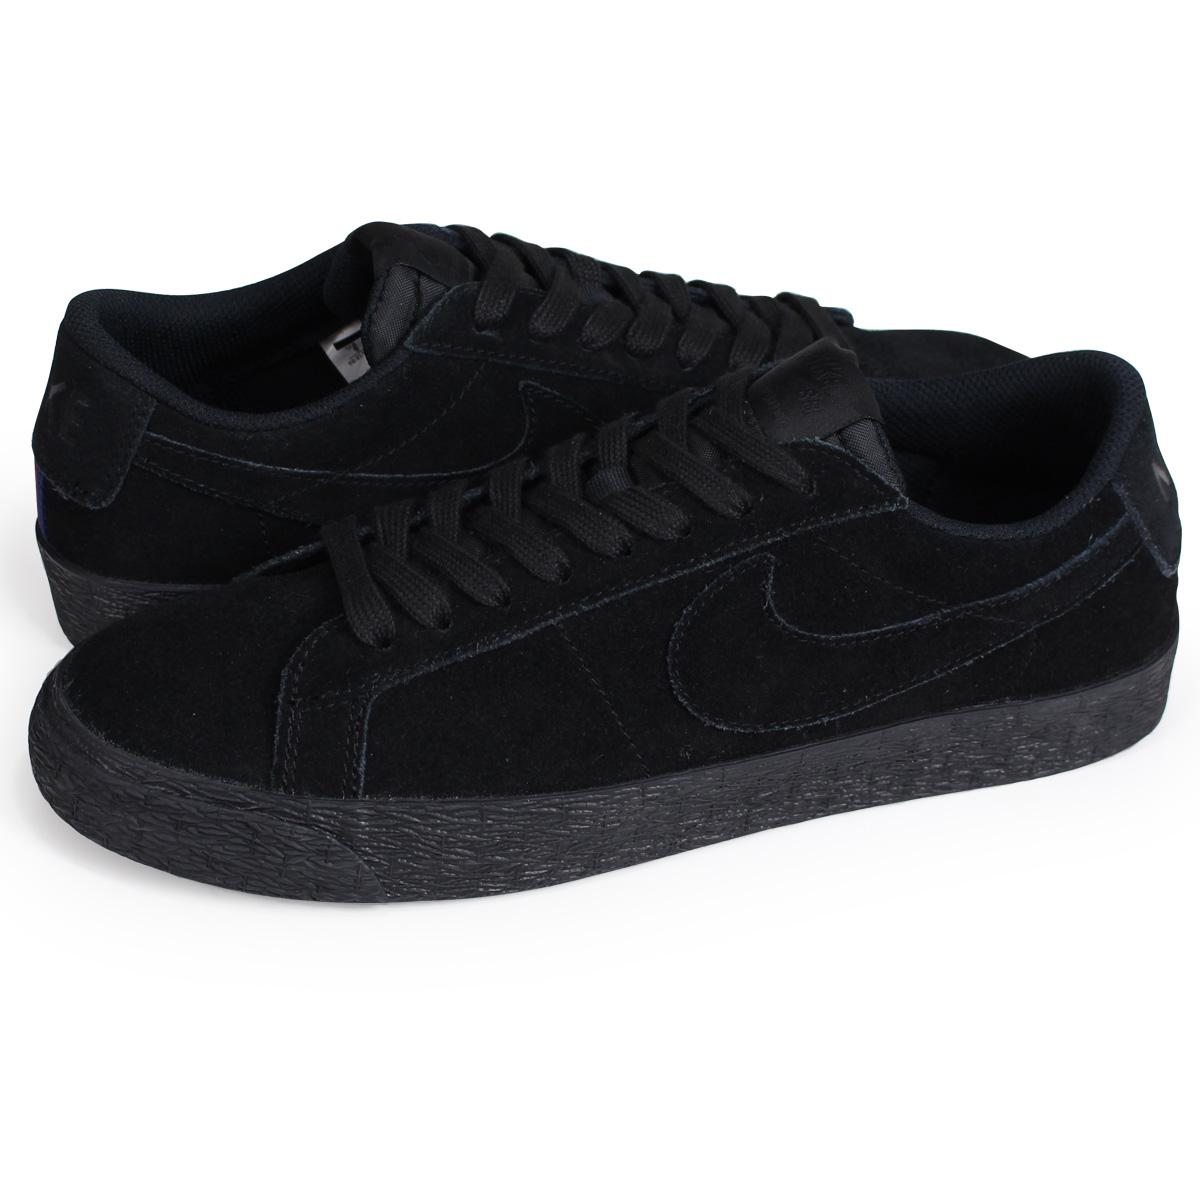 best website c0ea6 5cb6b Whats up Sports: NIKE SB ZOOM BLAZER LOW Nike blazer low sneakers ...